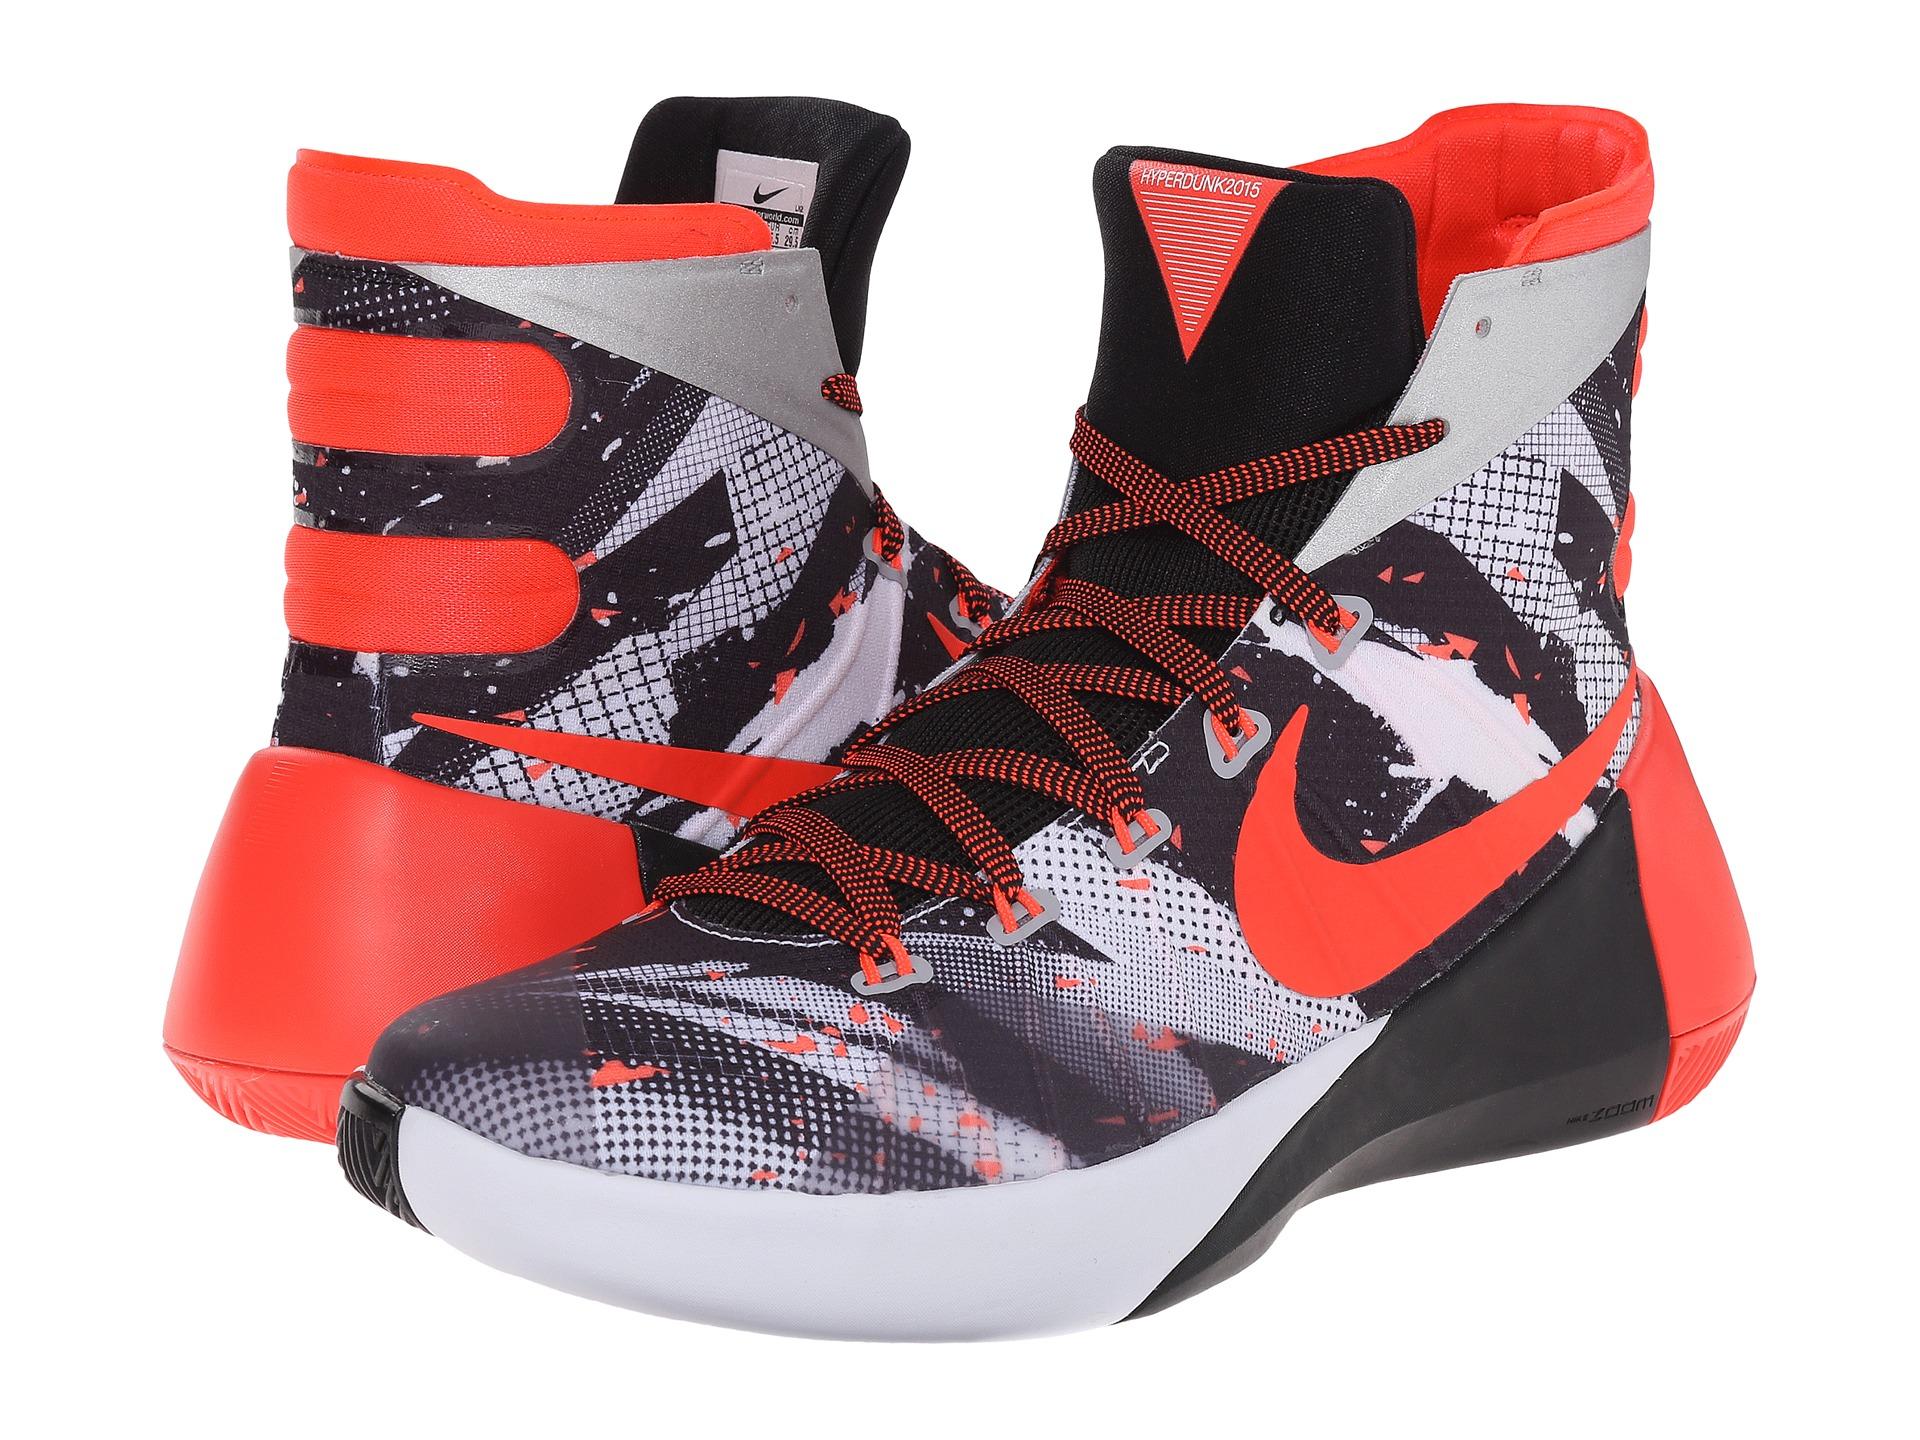 online store 604ce 3fa3e Lyst - Nike Hyperdunk 2015 Prm in Red for Men